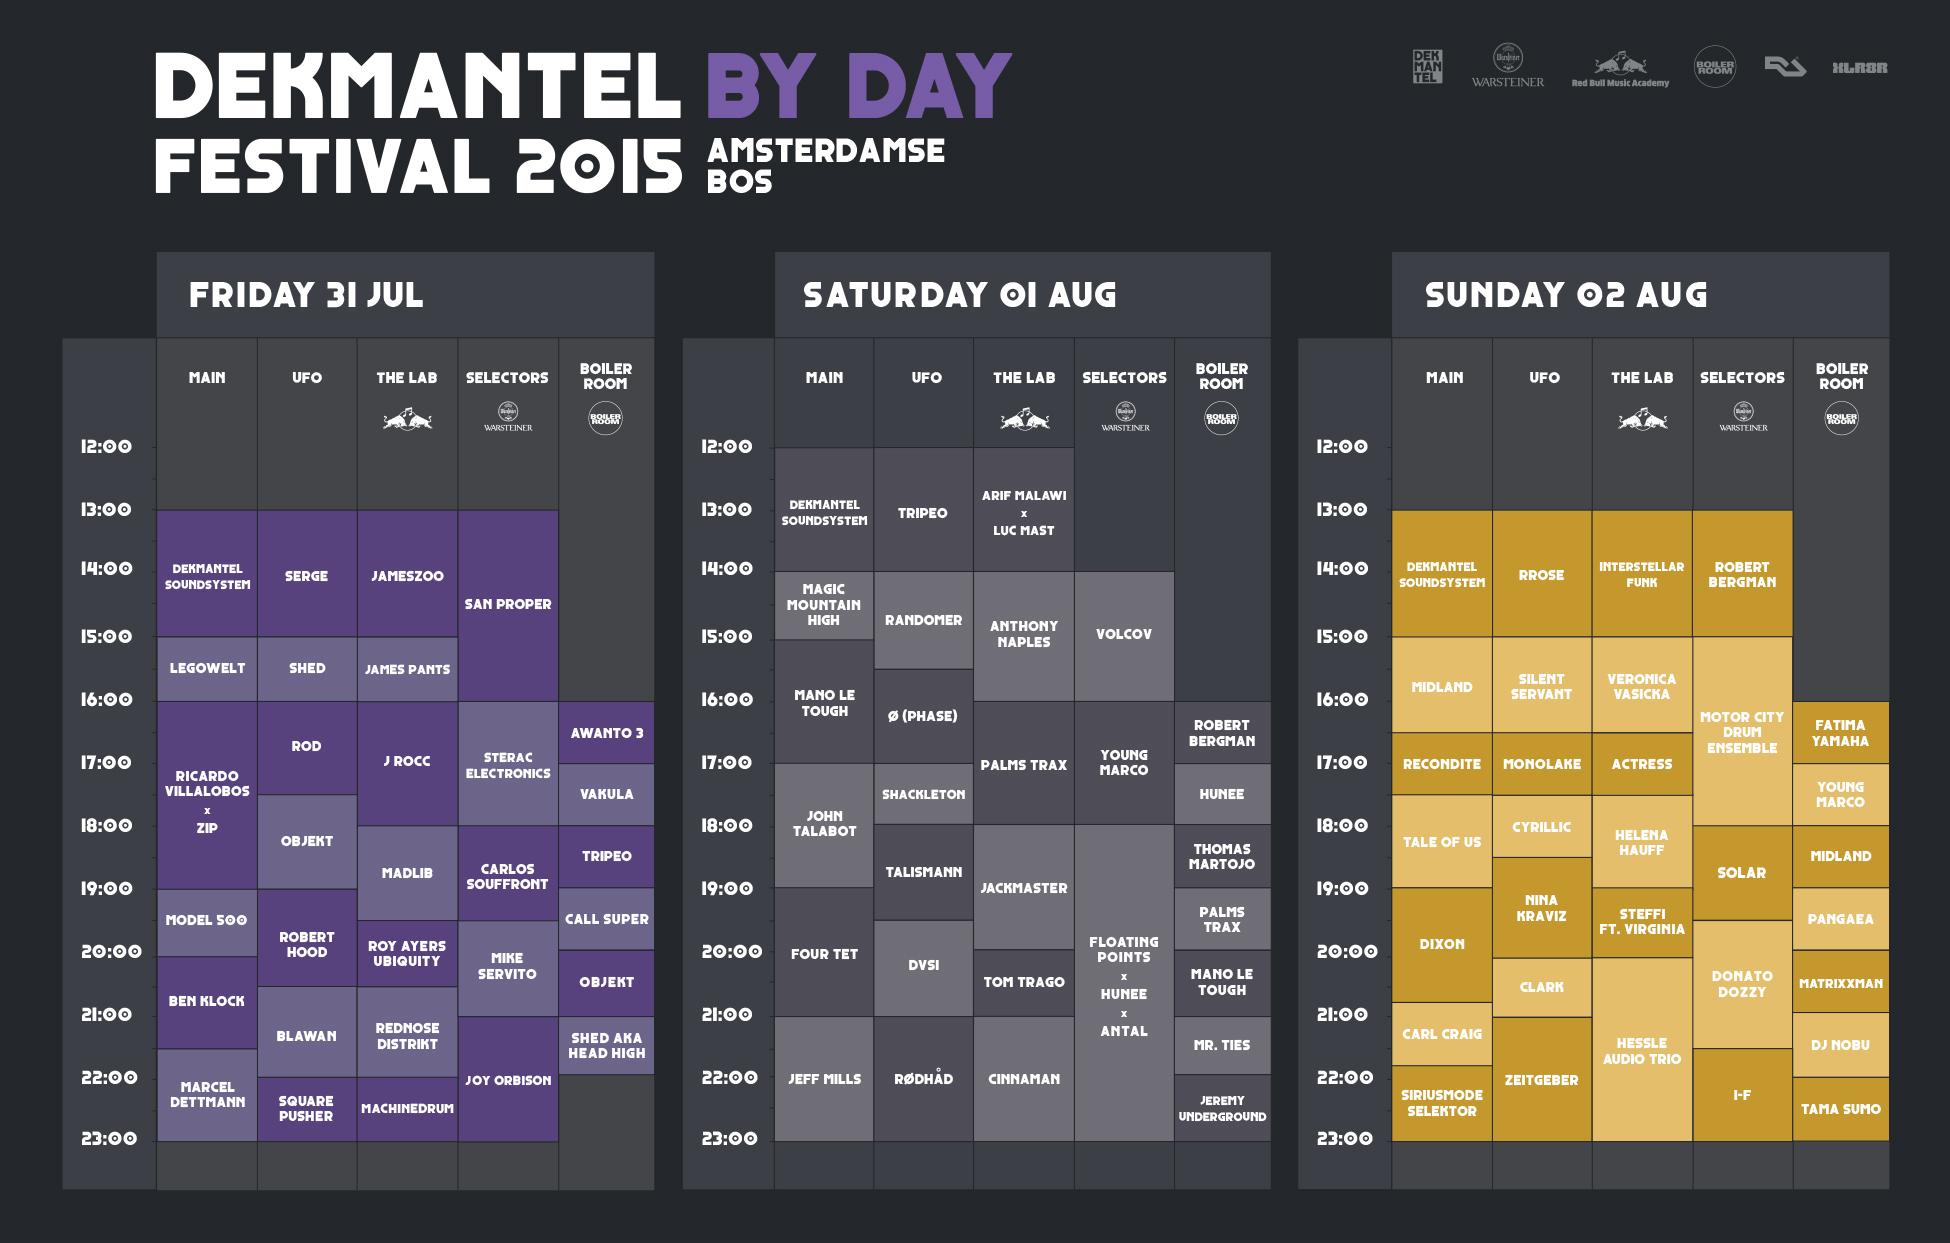 Dekmantel Festival 2015 - timetable - 005